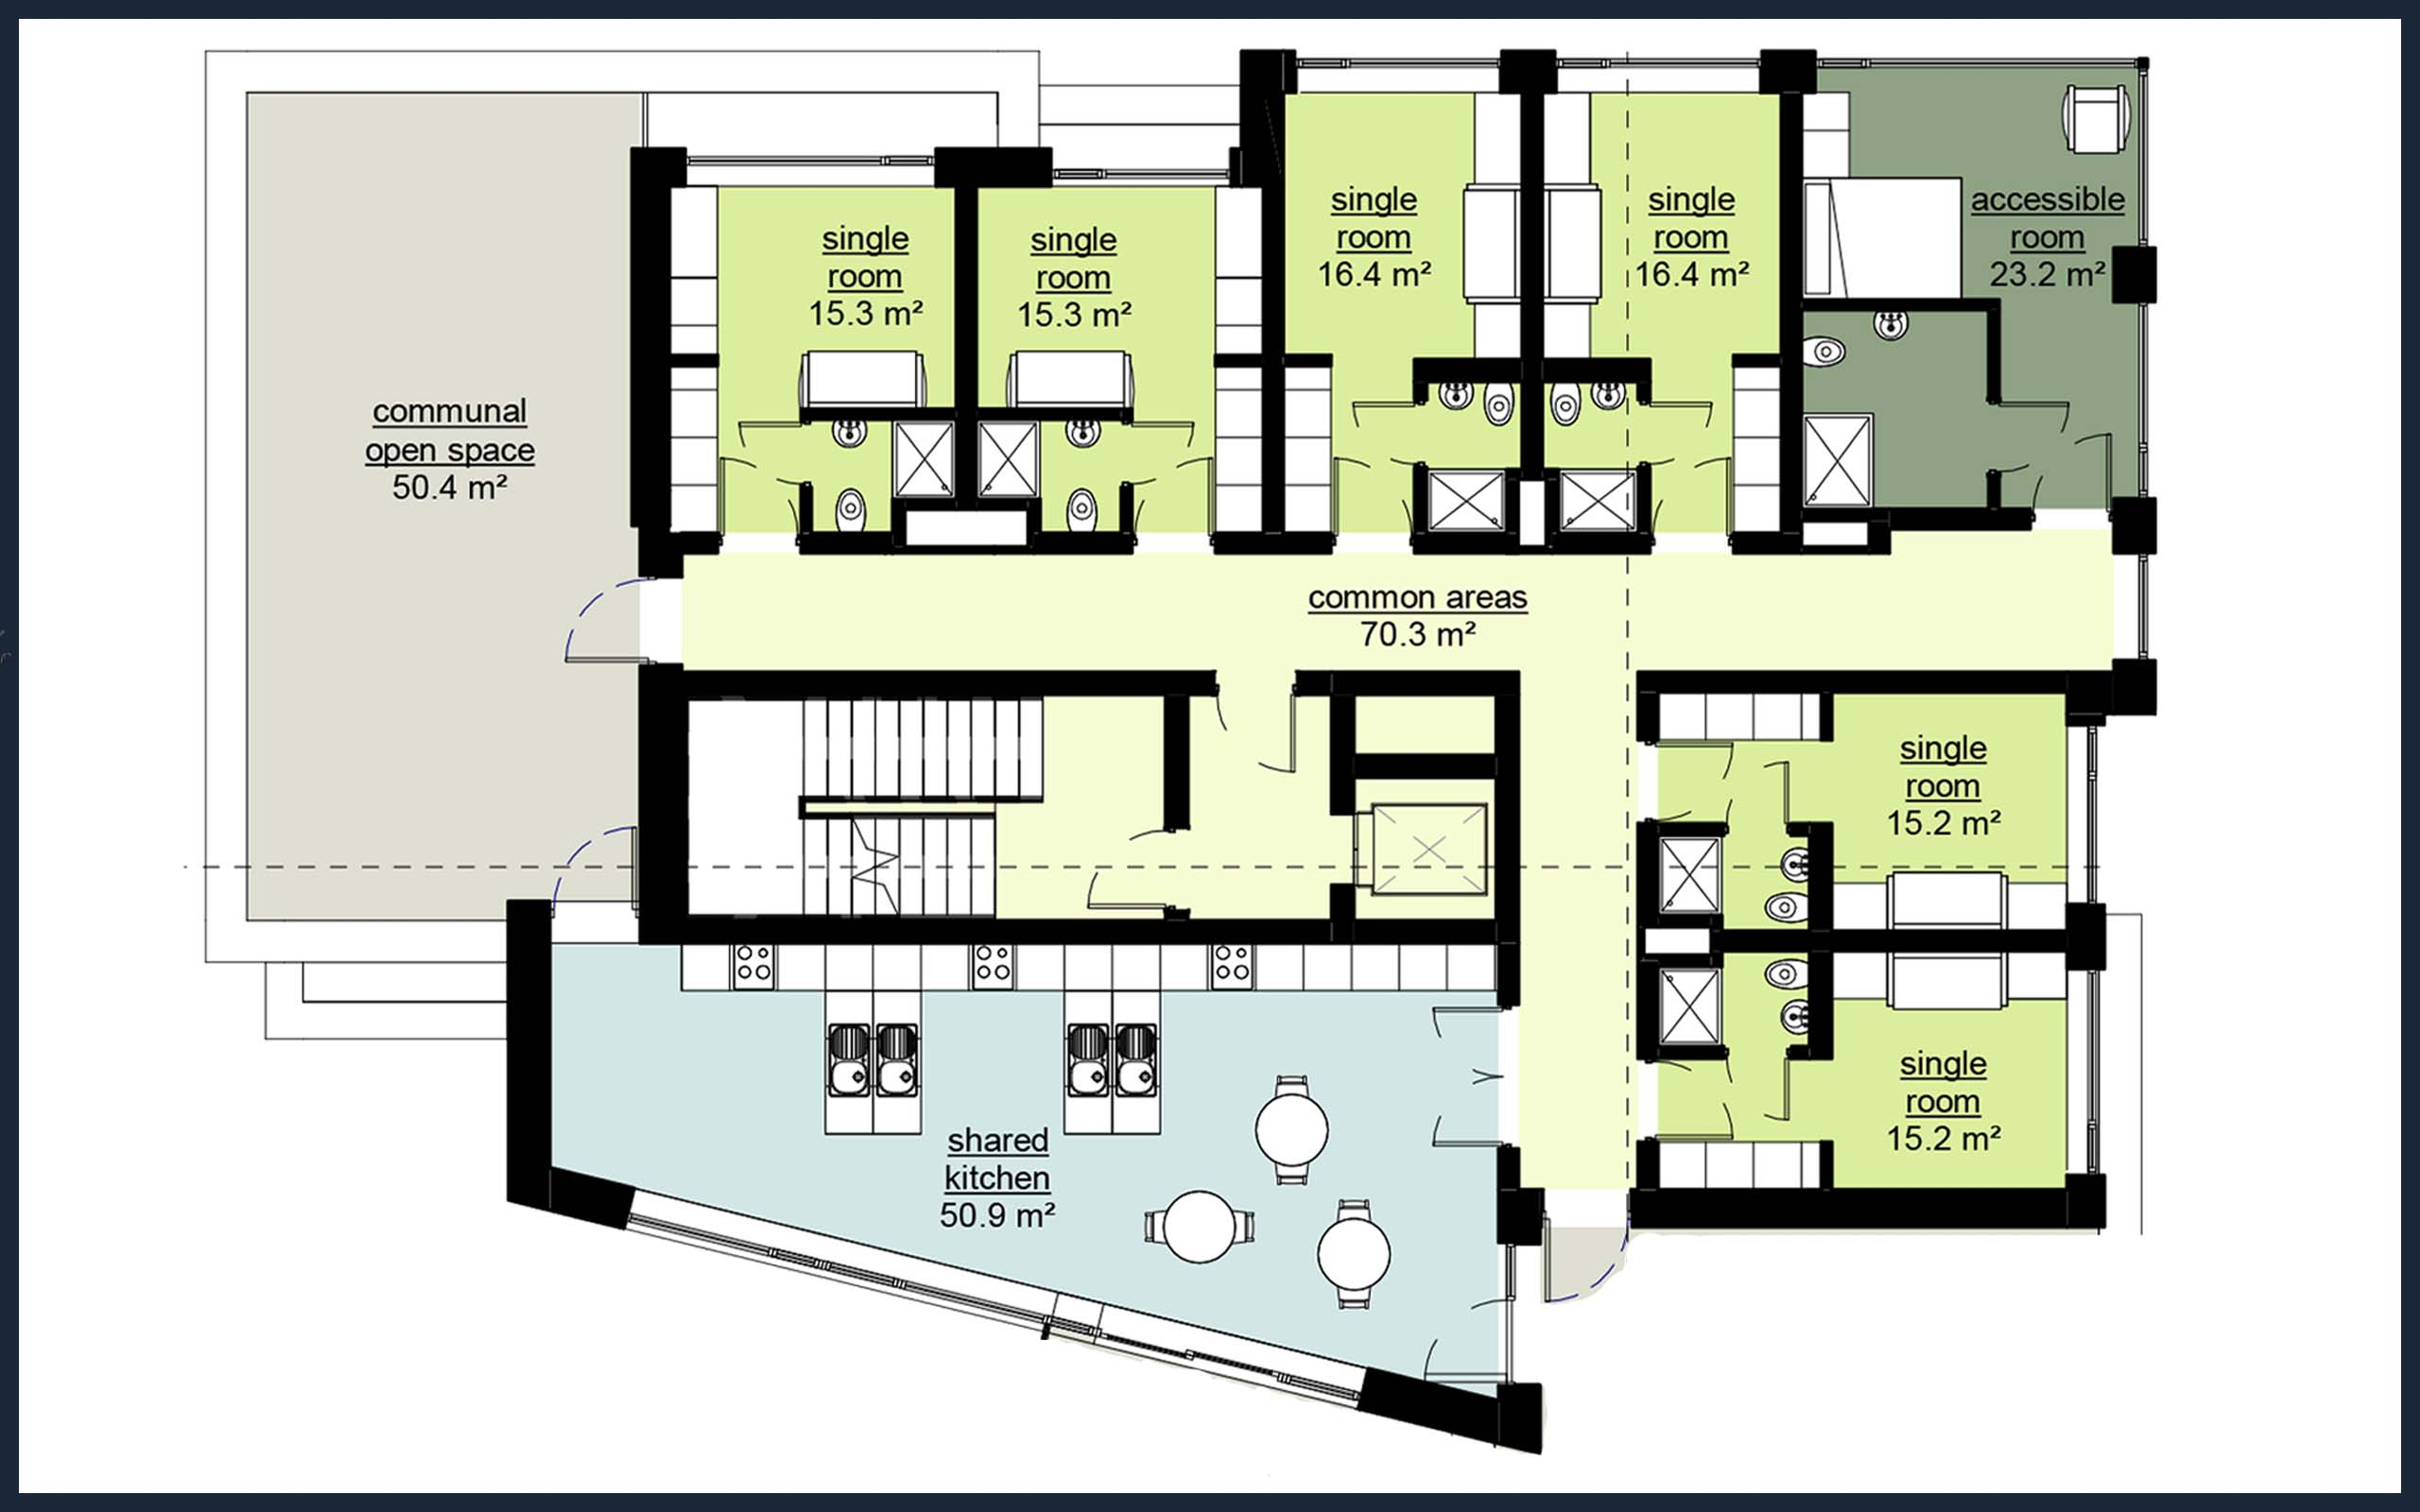 2D Floor Plans of Apartment Development